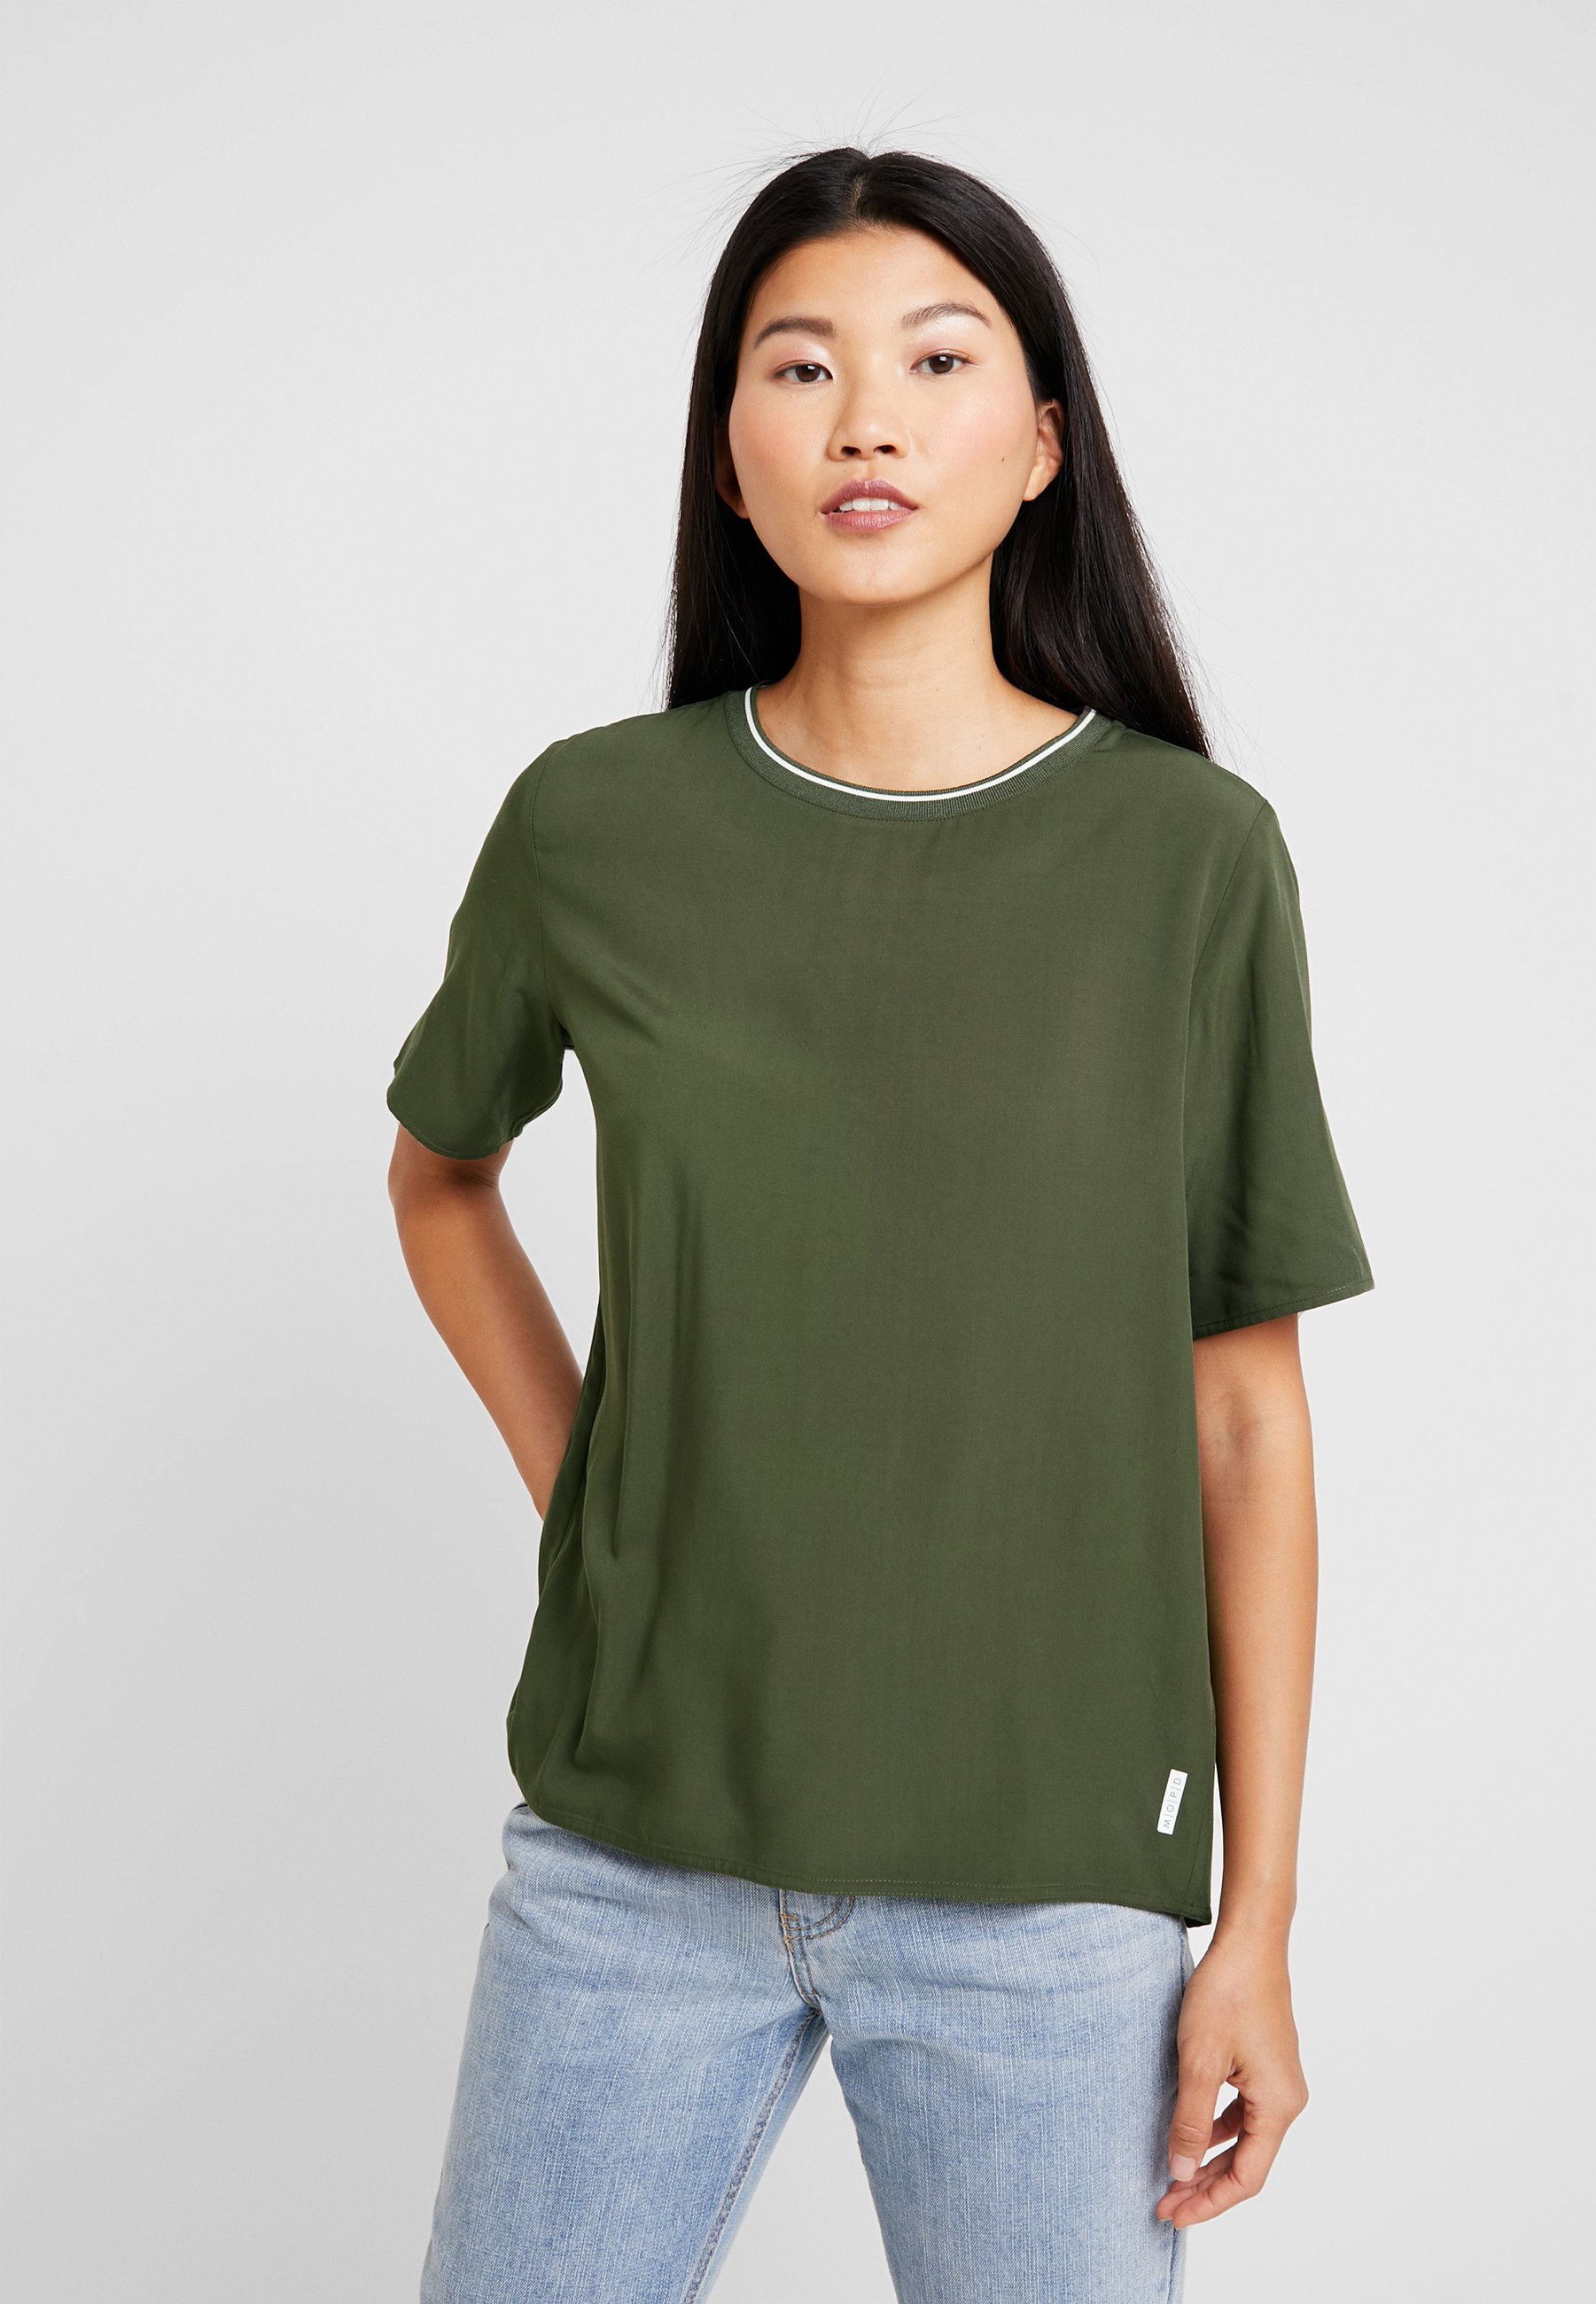 shirt O'polo Green Denim T Marc BasiqueAction 8Nyn0OwvmP